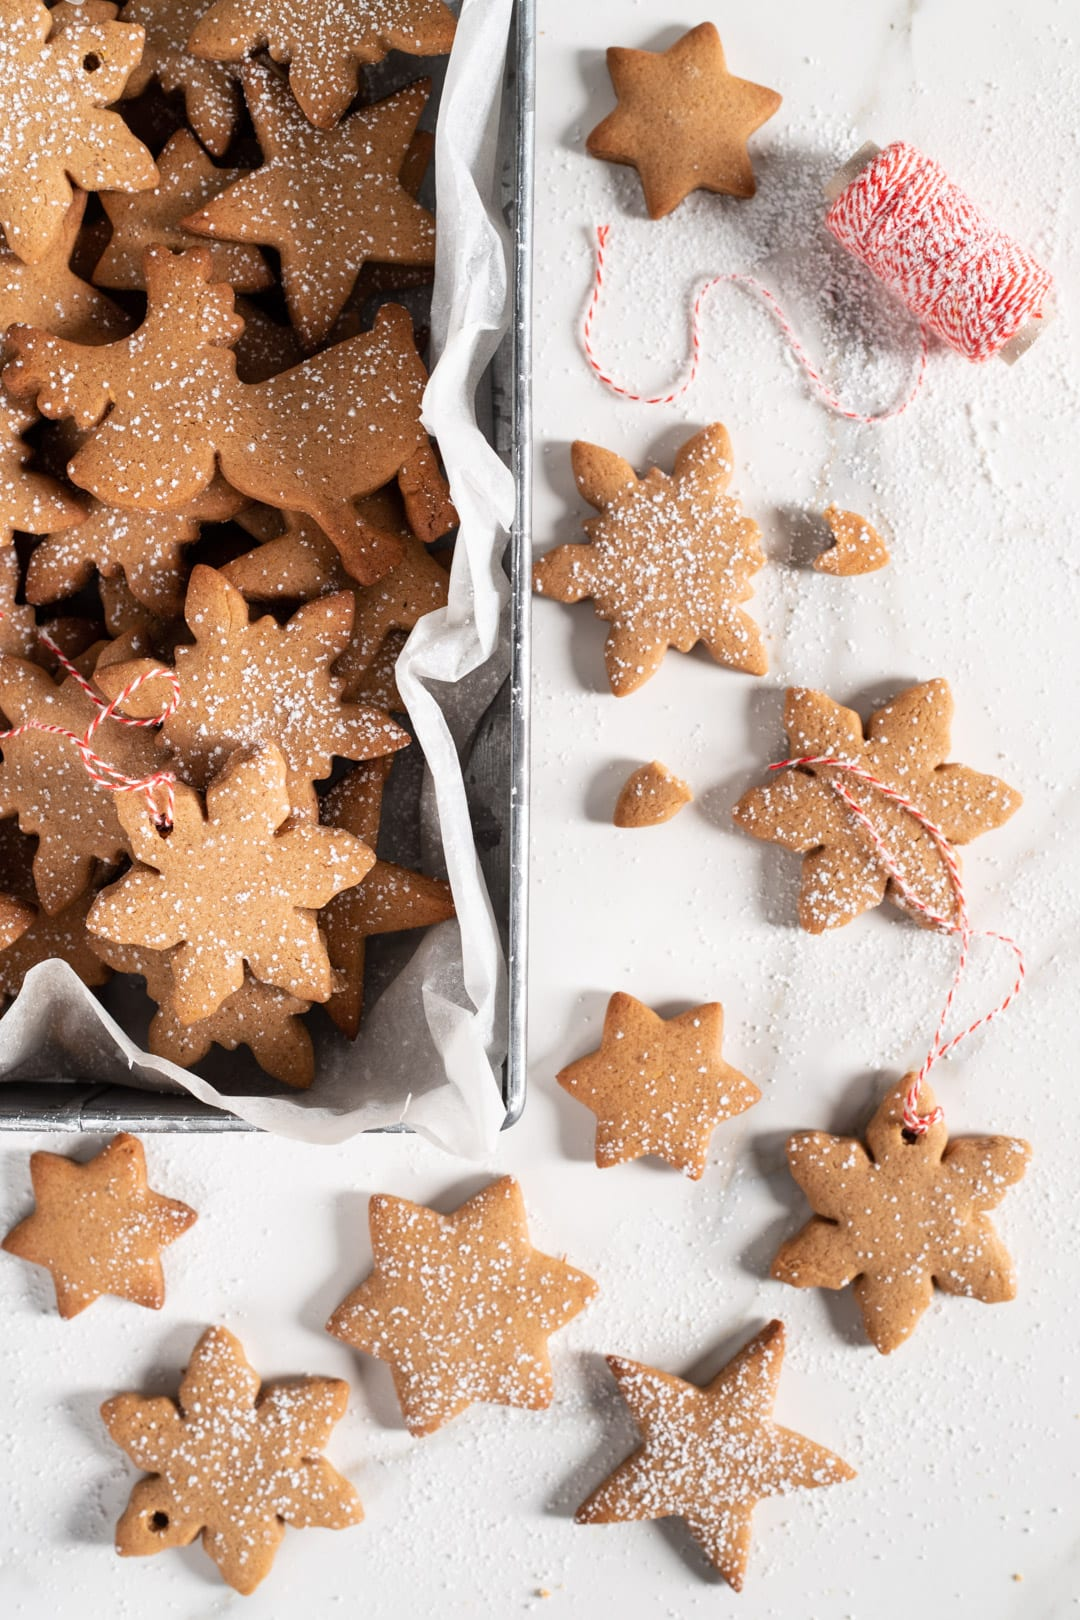 Biscotti svedesi pepparkakor pronti da gustare